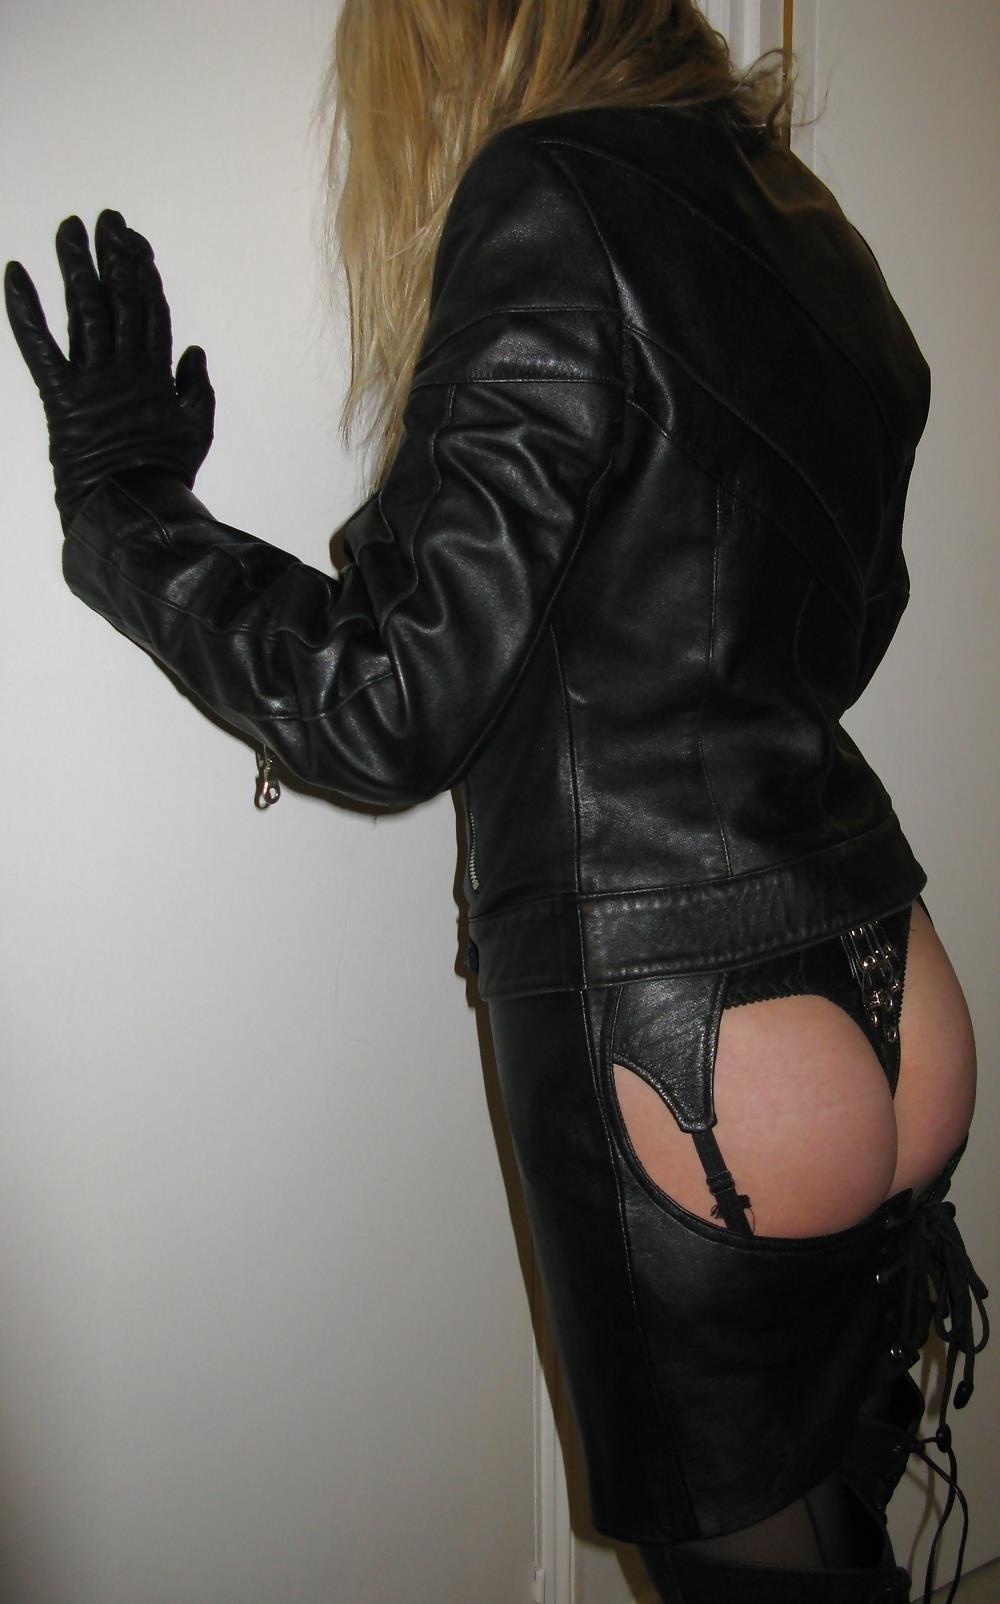 Leather girl bdsm-7681